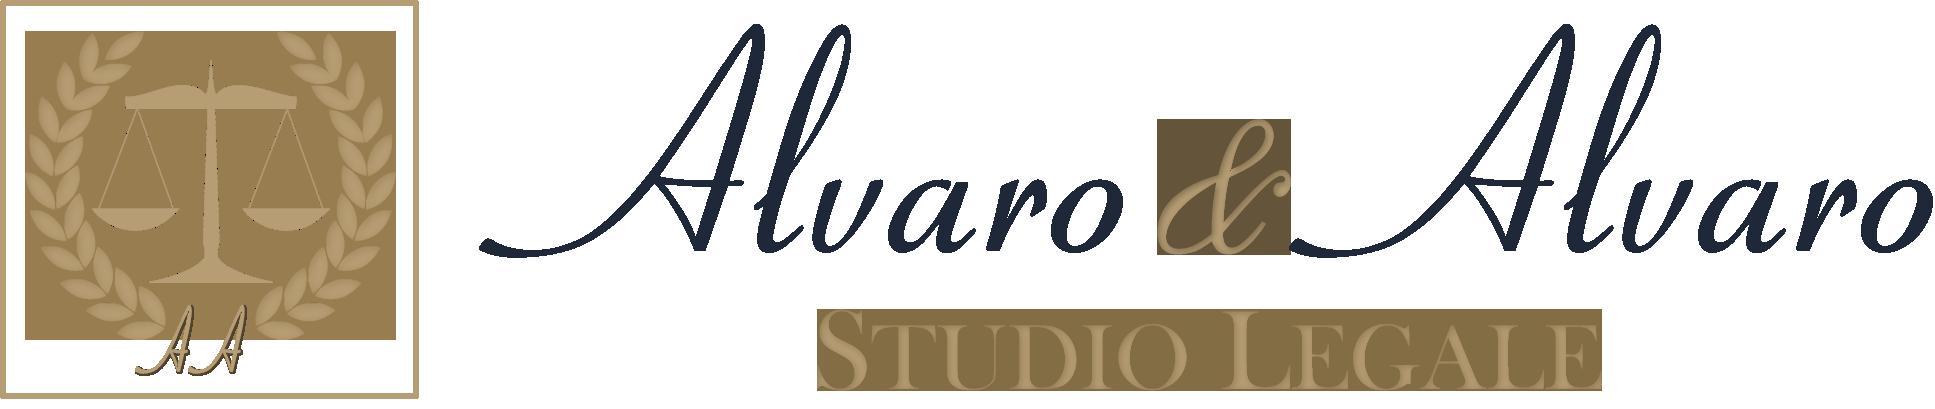 Studio Legale Alvaro & Alvaro